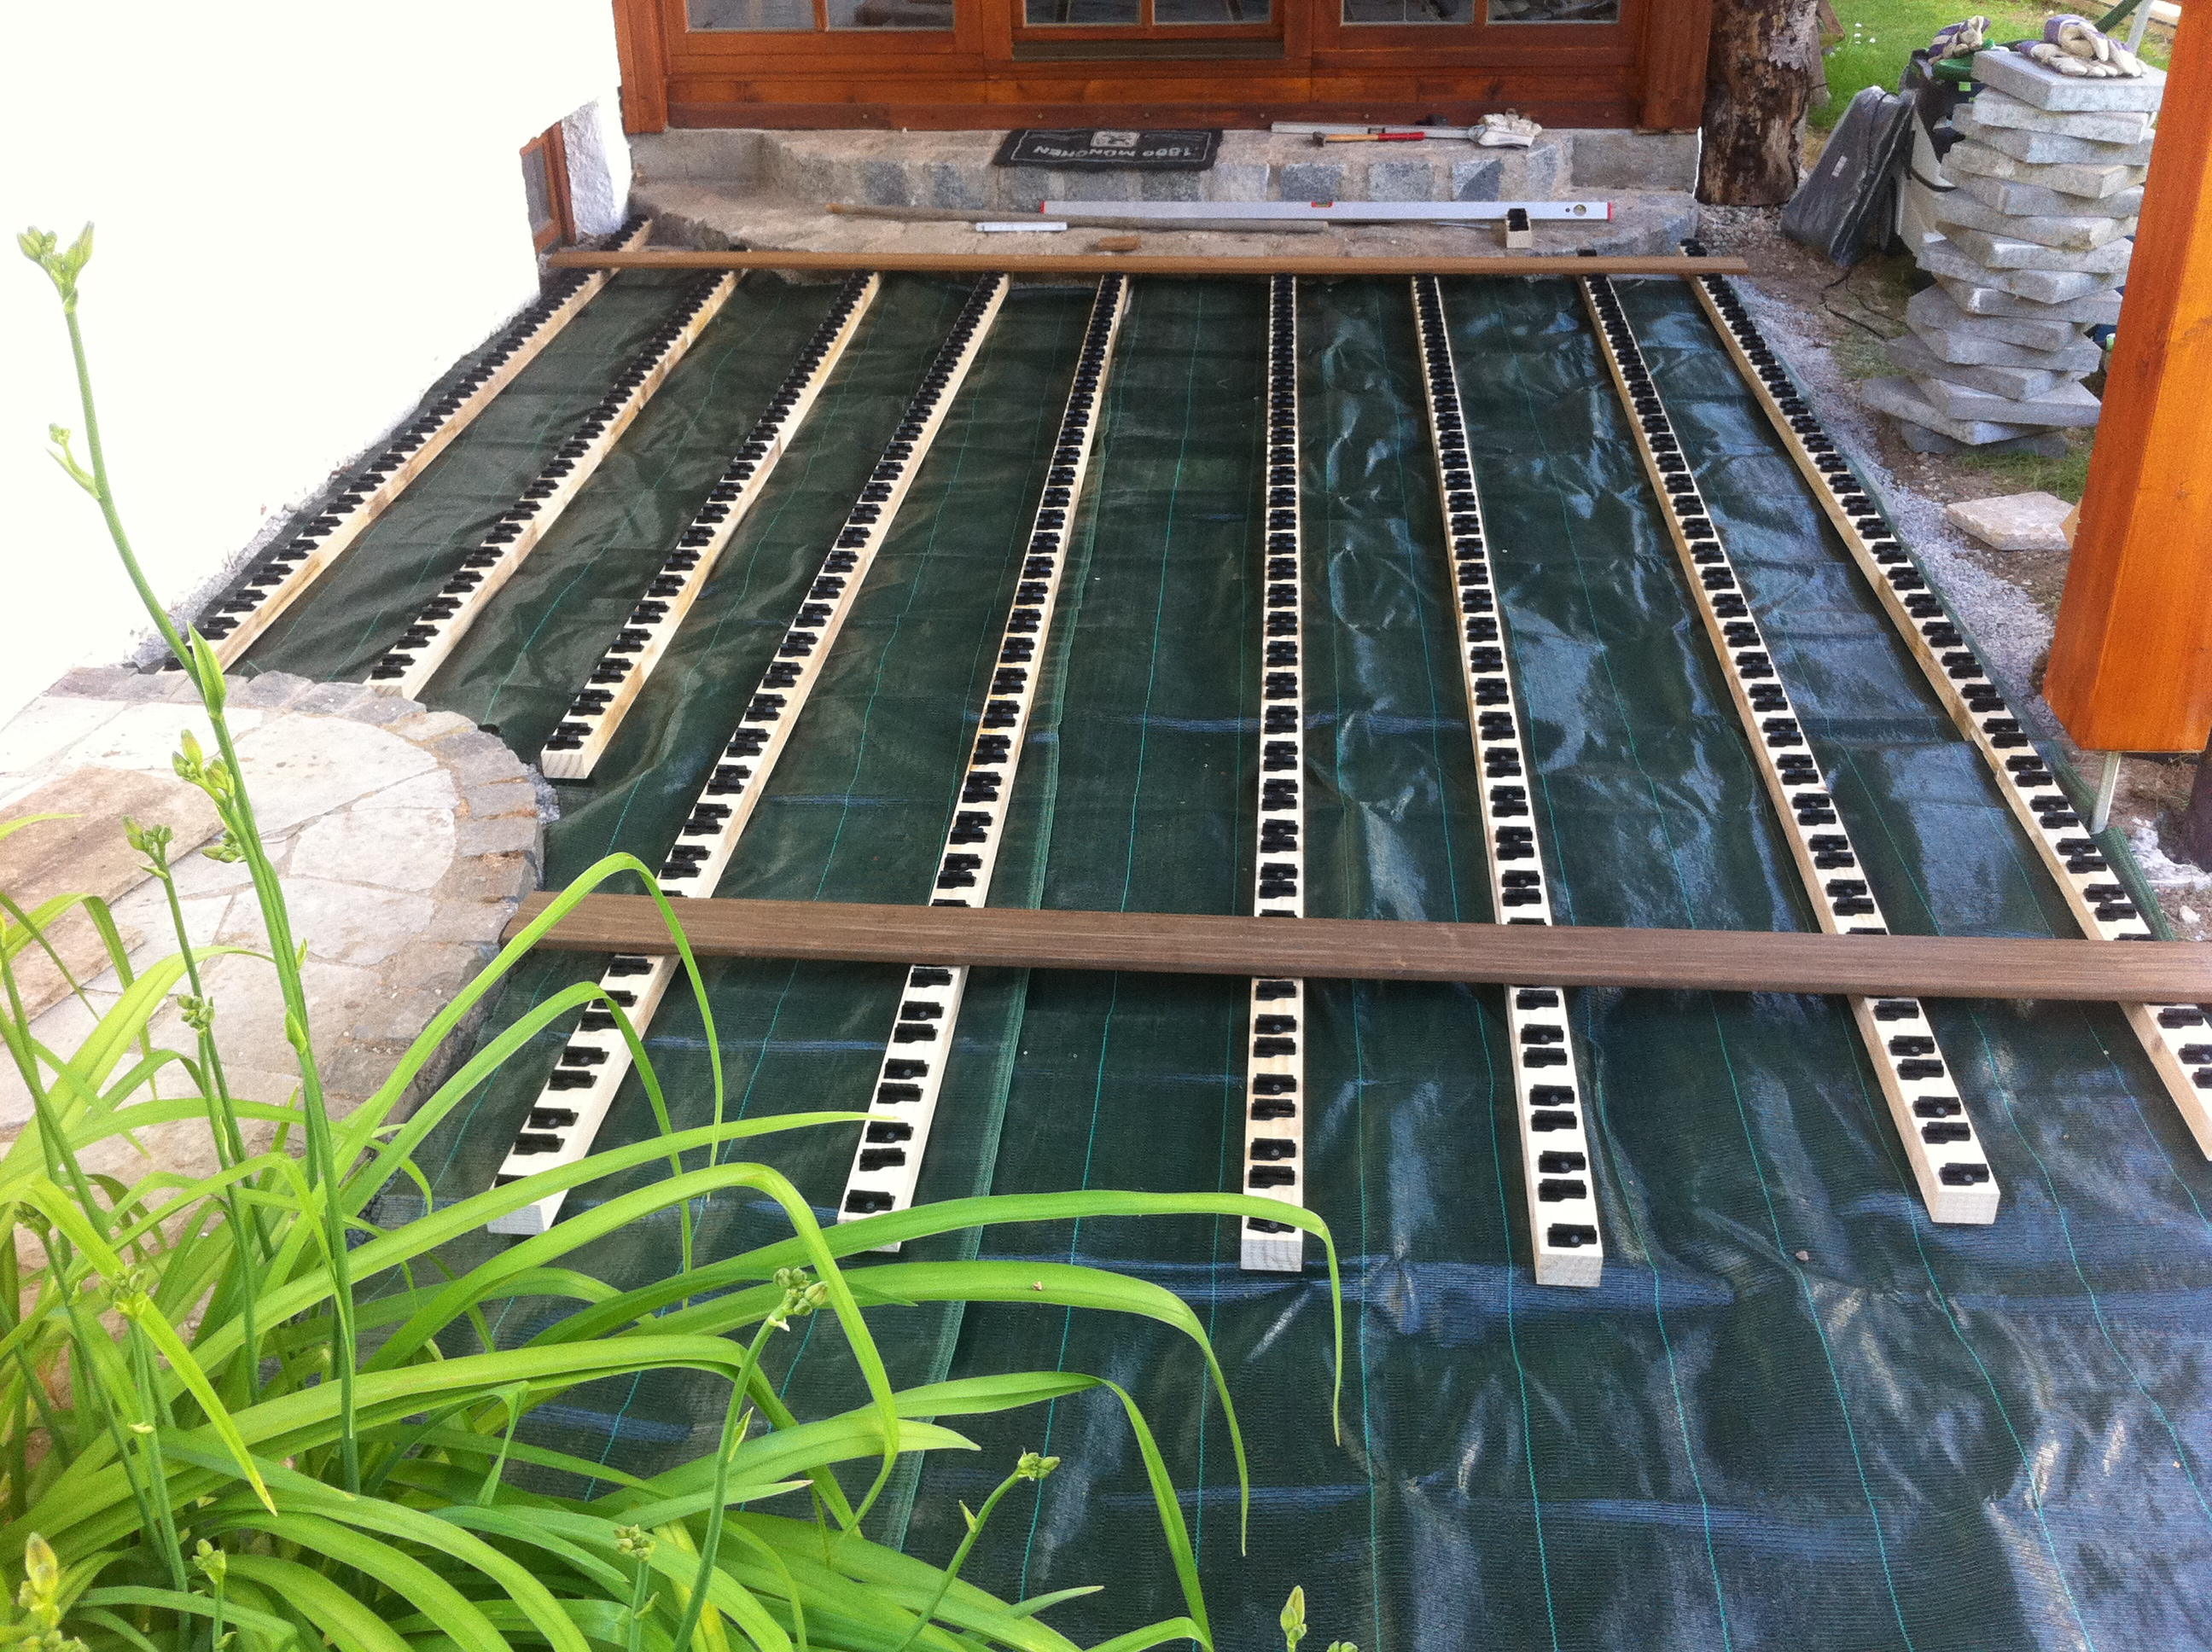 Holzterrassen mit Clipsystem